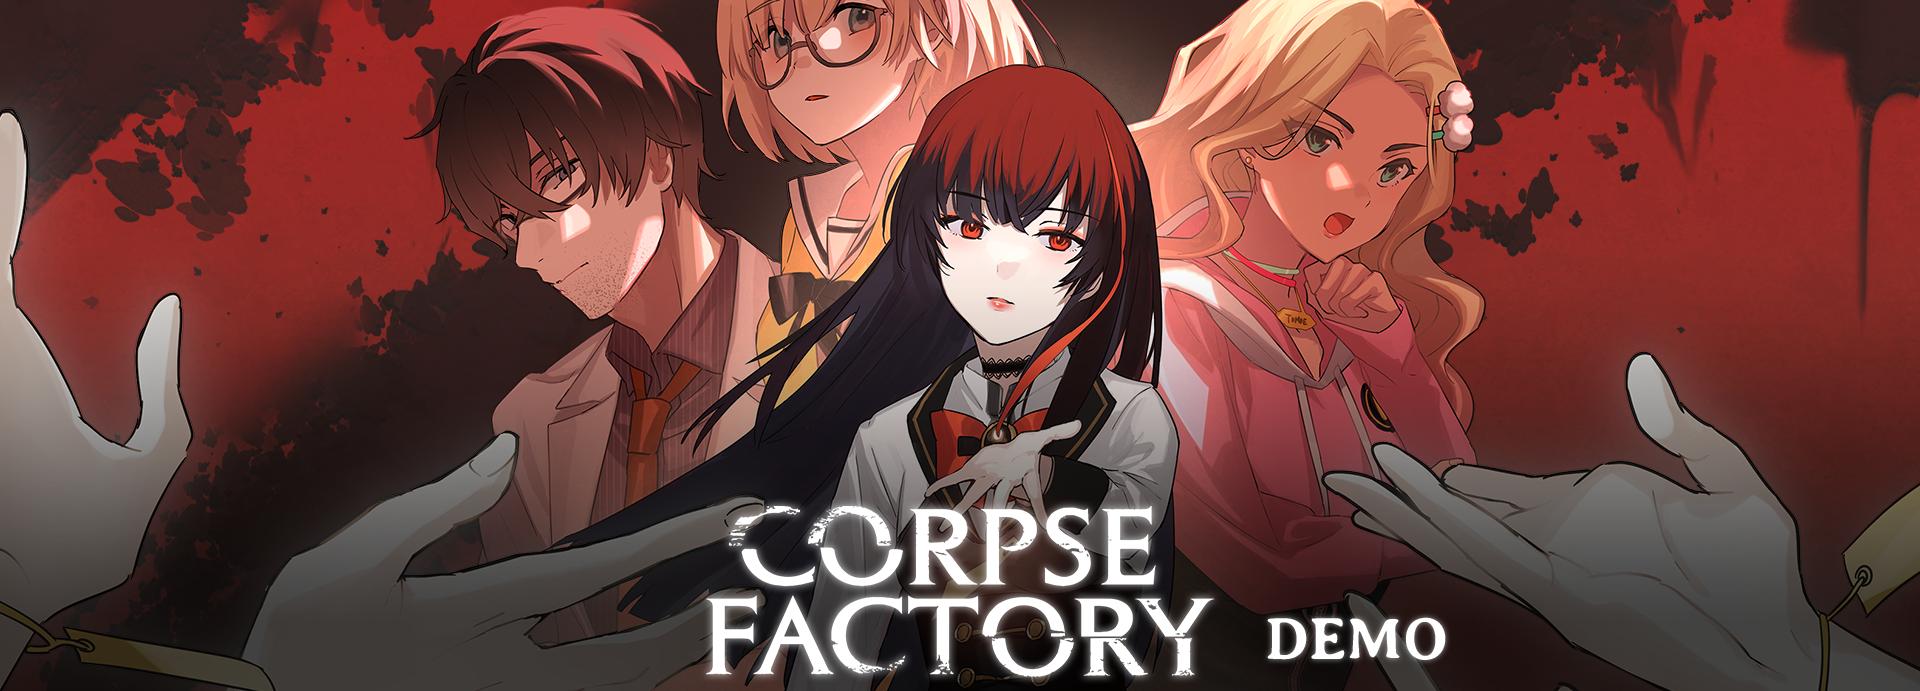 CORPSE FACTORY Demo